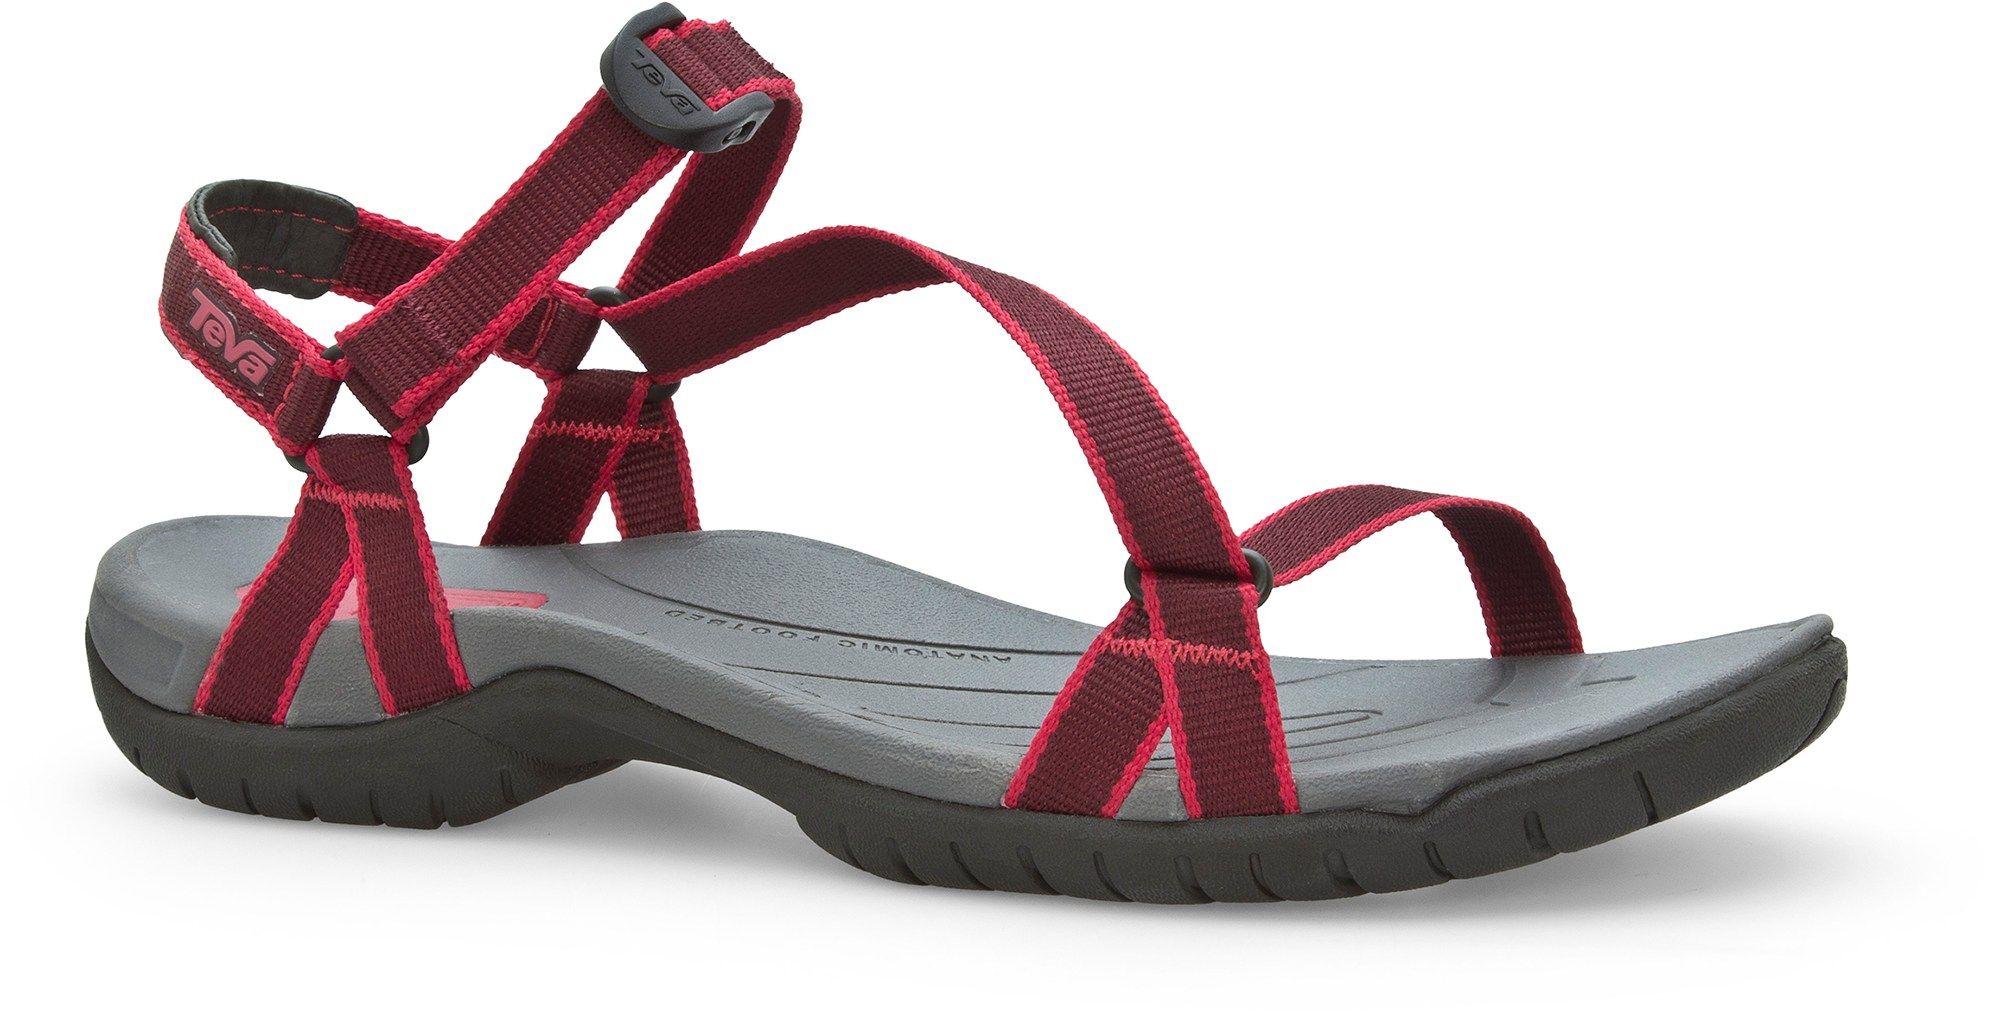 2e2501a352b 70 Zirra Teva In 11 Wishlist Size Sandals My Women's 2019 awqqHpvB